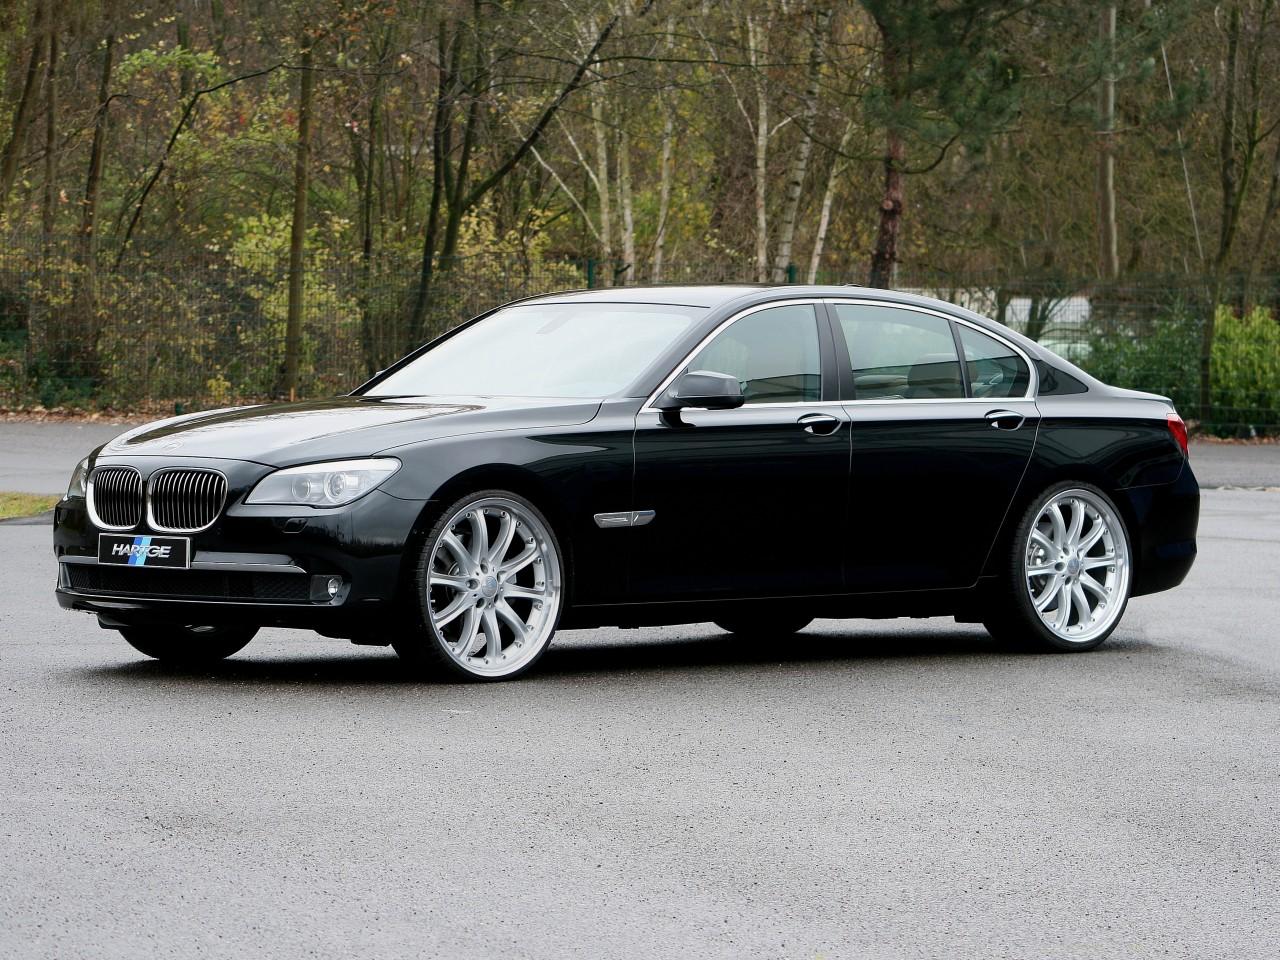 BMW_7-series_F01_Hartge_rims_01.jpg